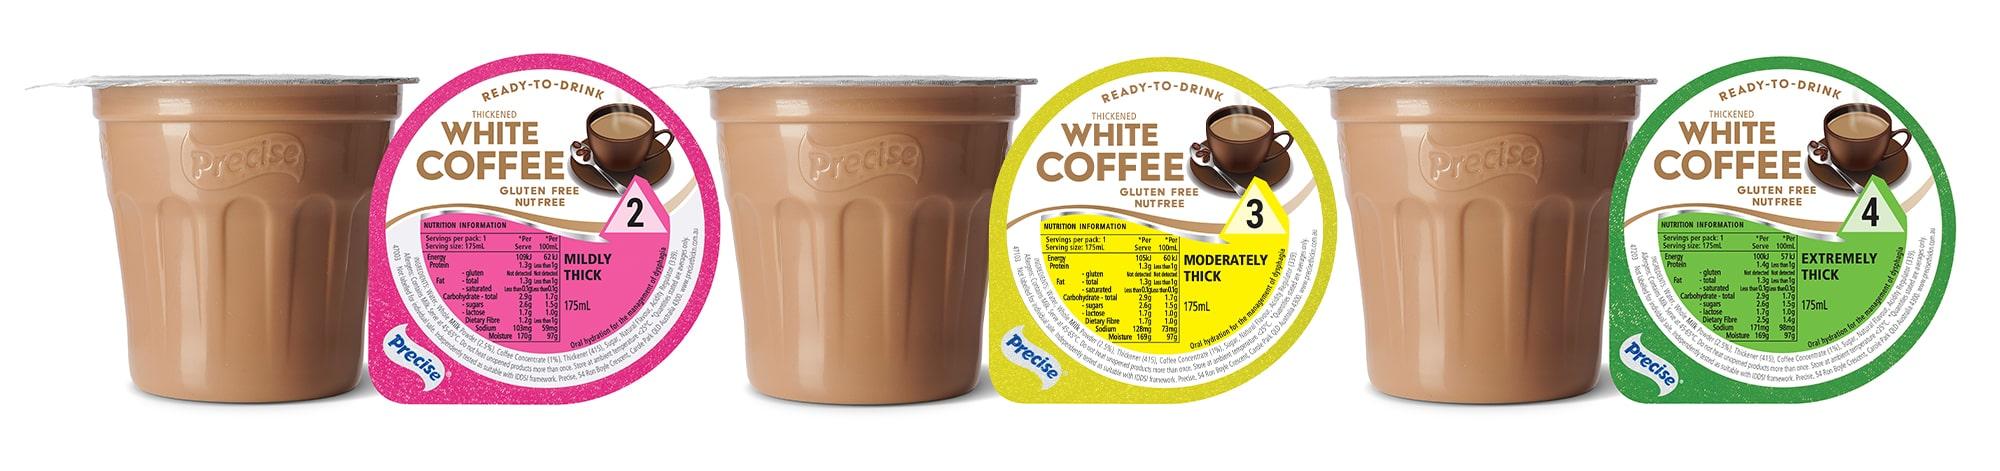 RTD White Coffee